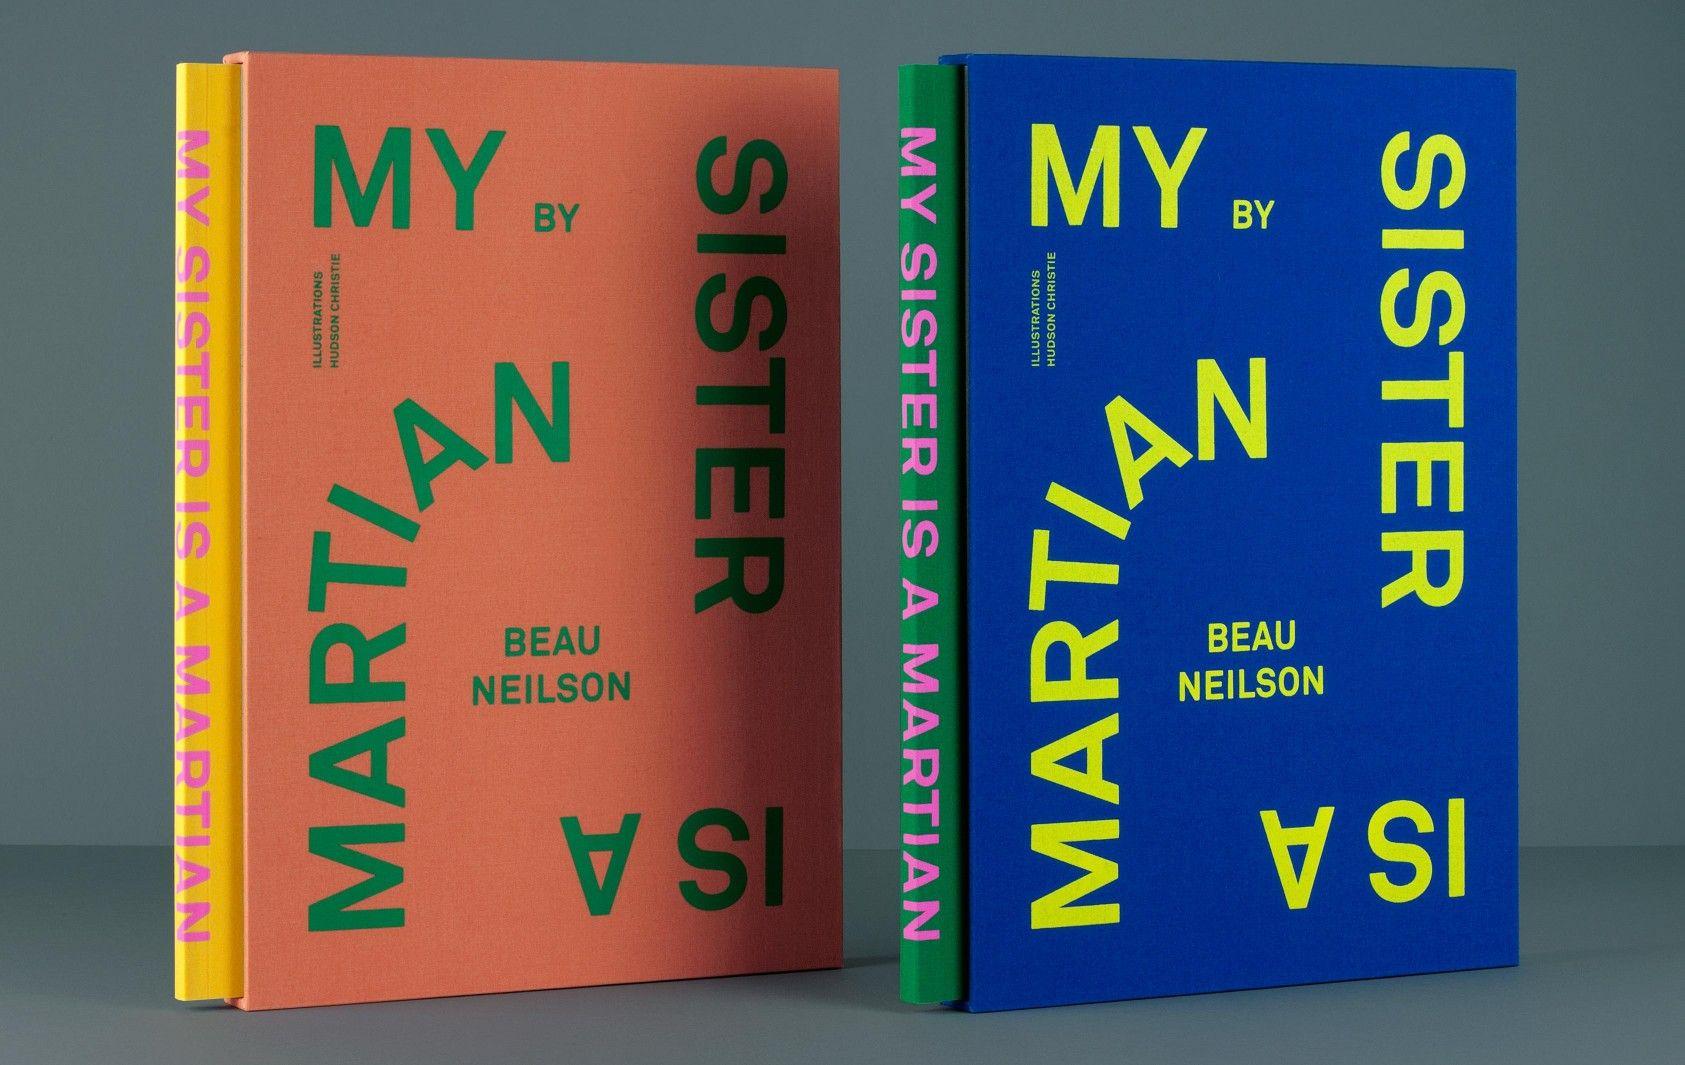 Pin de VLW en • typography • | Pinterest